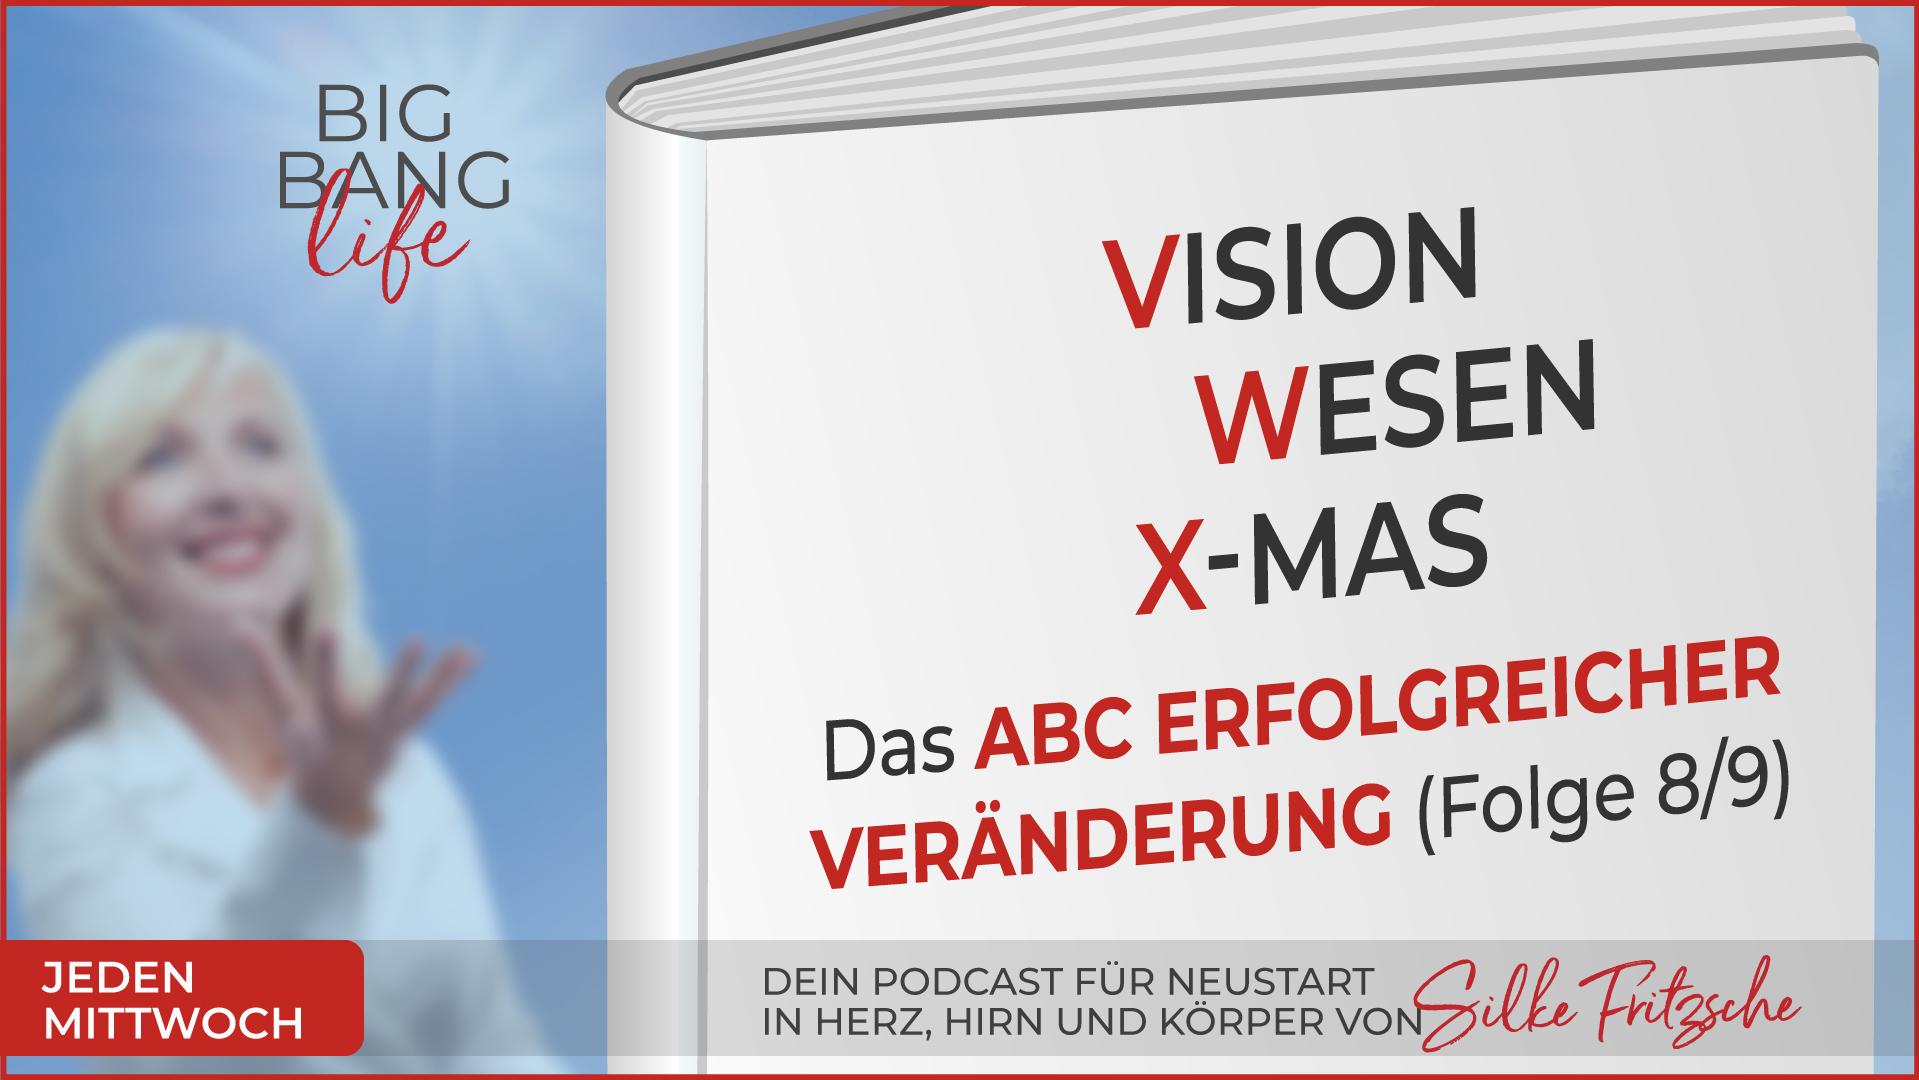 Der Big Bang life Podcast mit Silke Fritzsche - Vision, Wesen, X-Mas